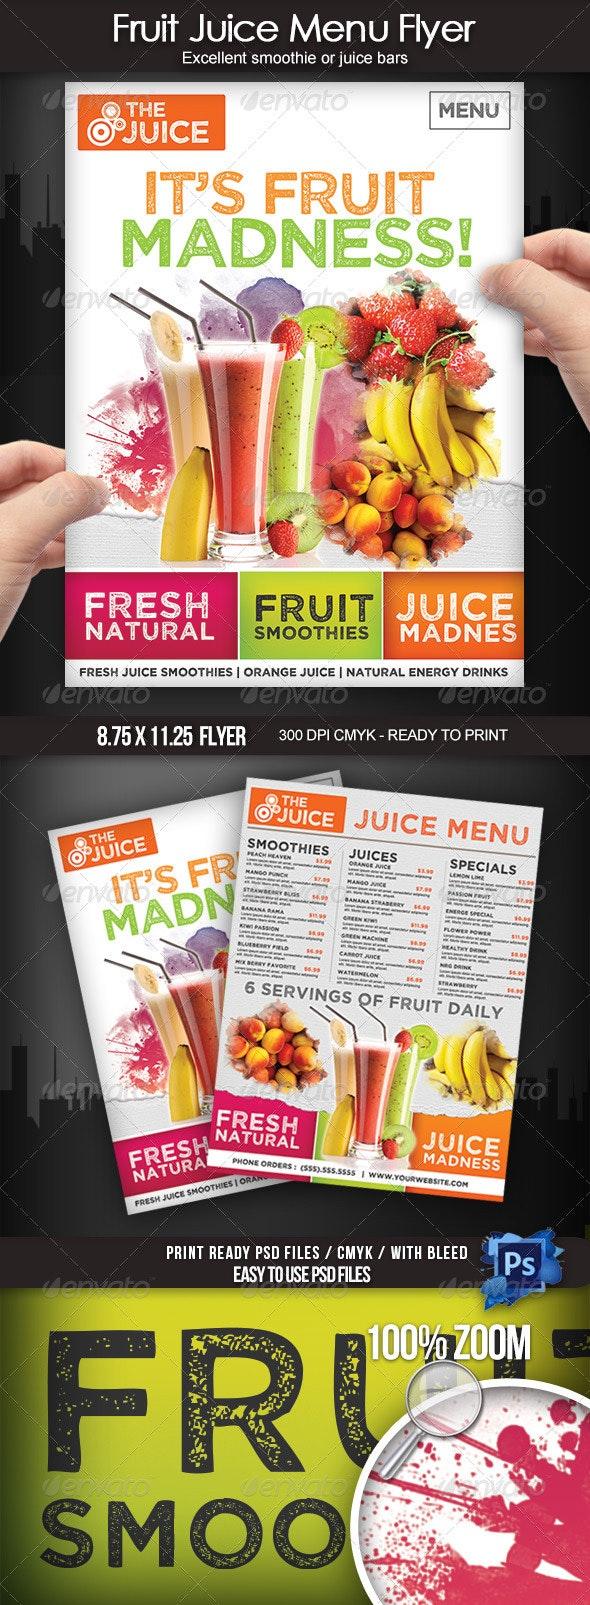 Fruit Juice Menu Flyer - Food Menus Print Templates